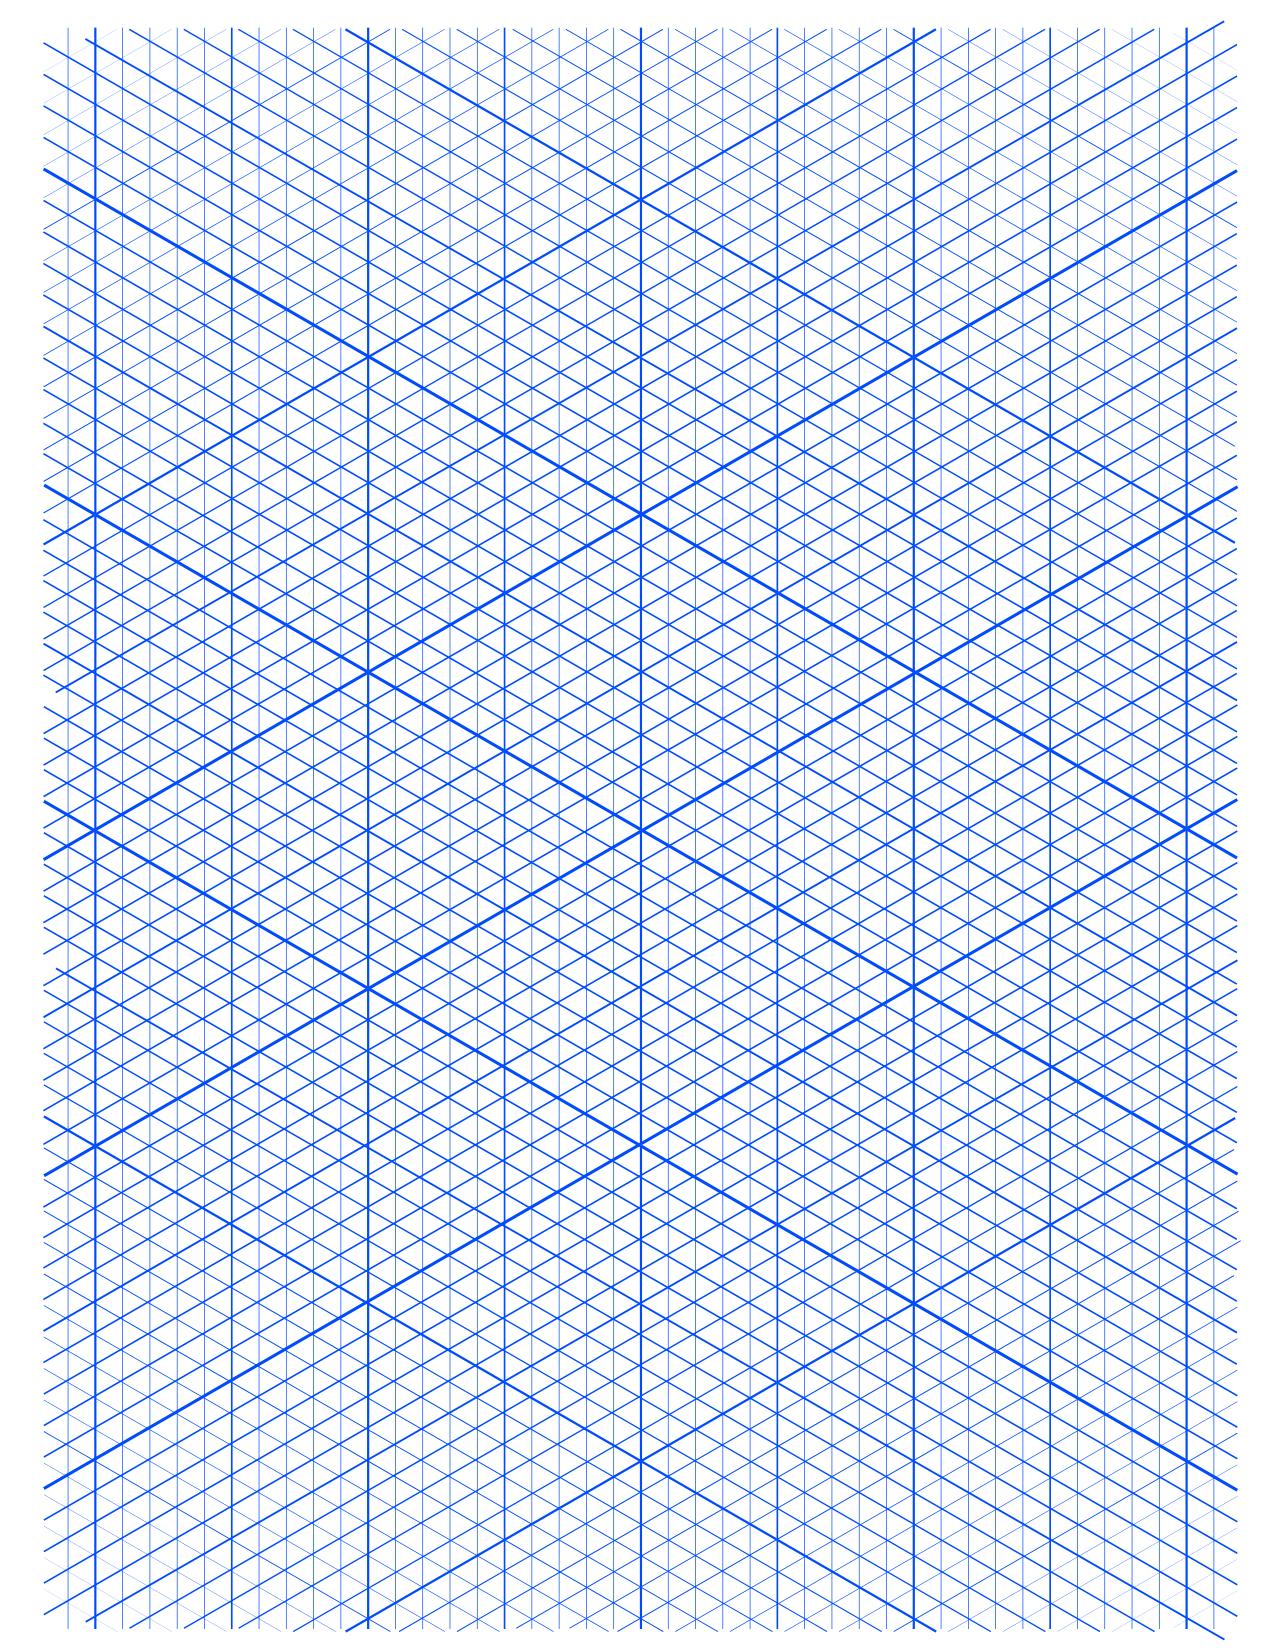 Isometric Grid Paper A4